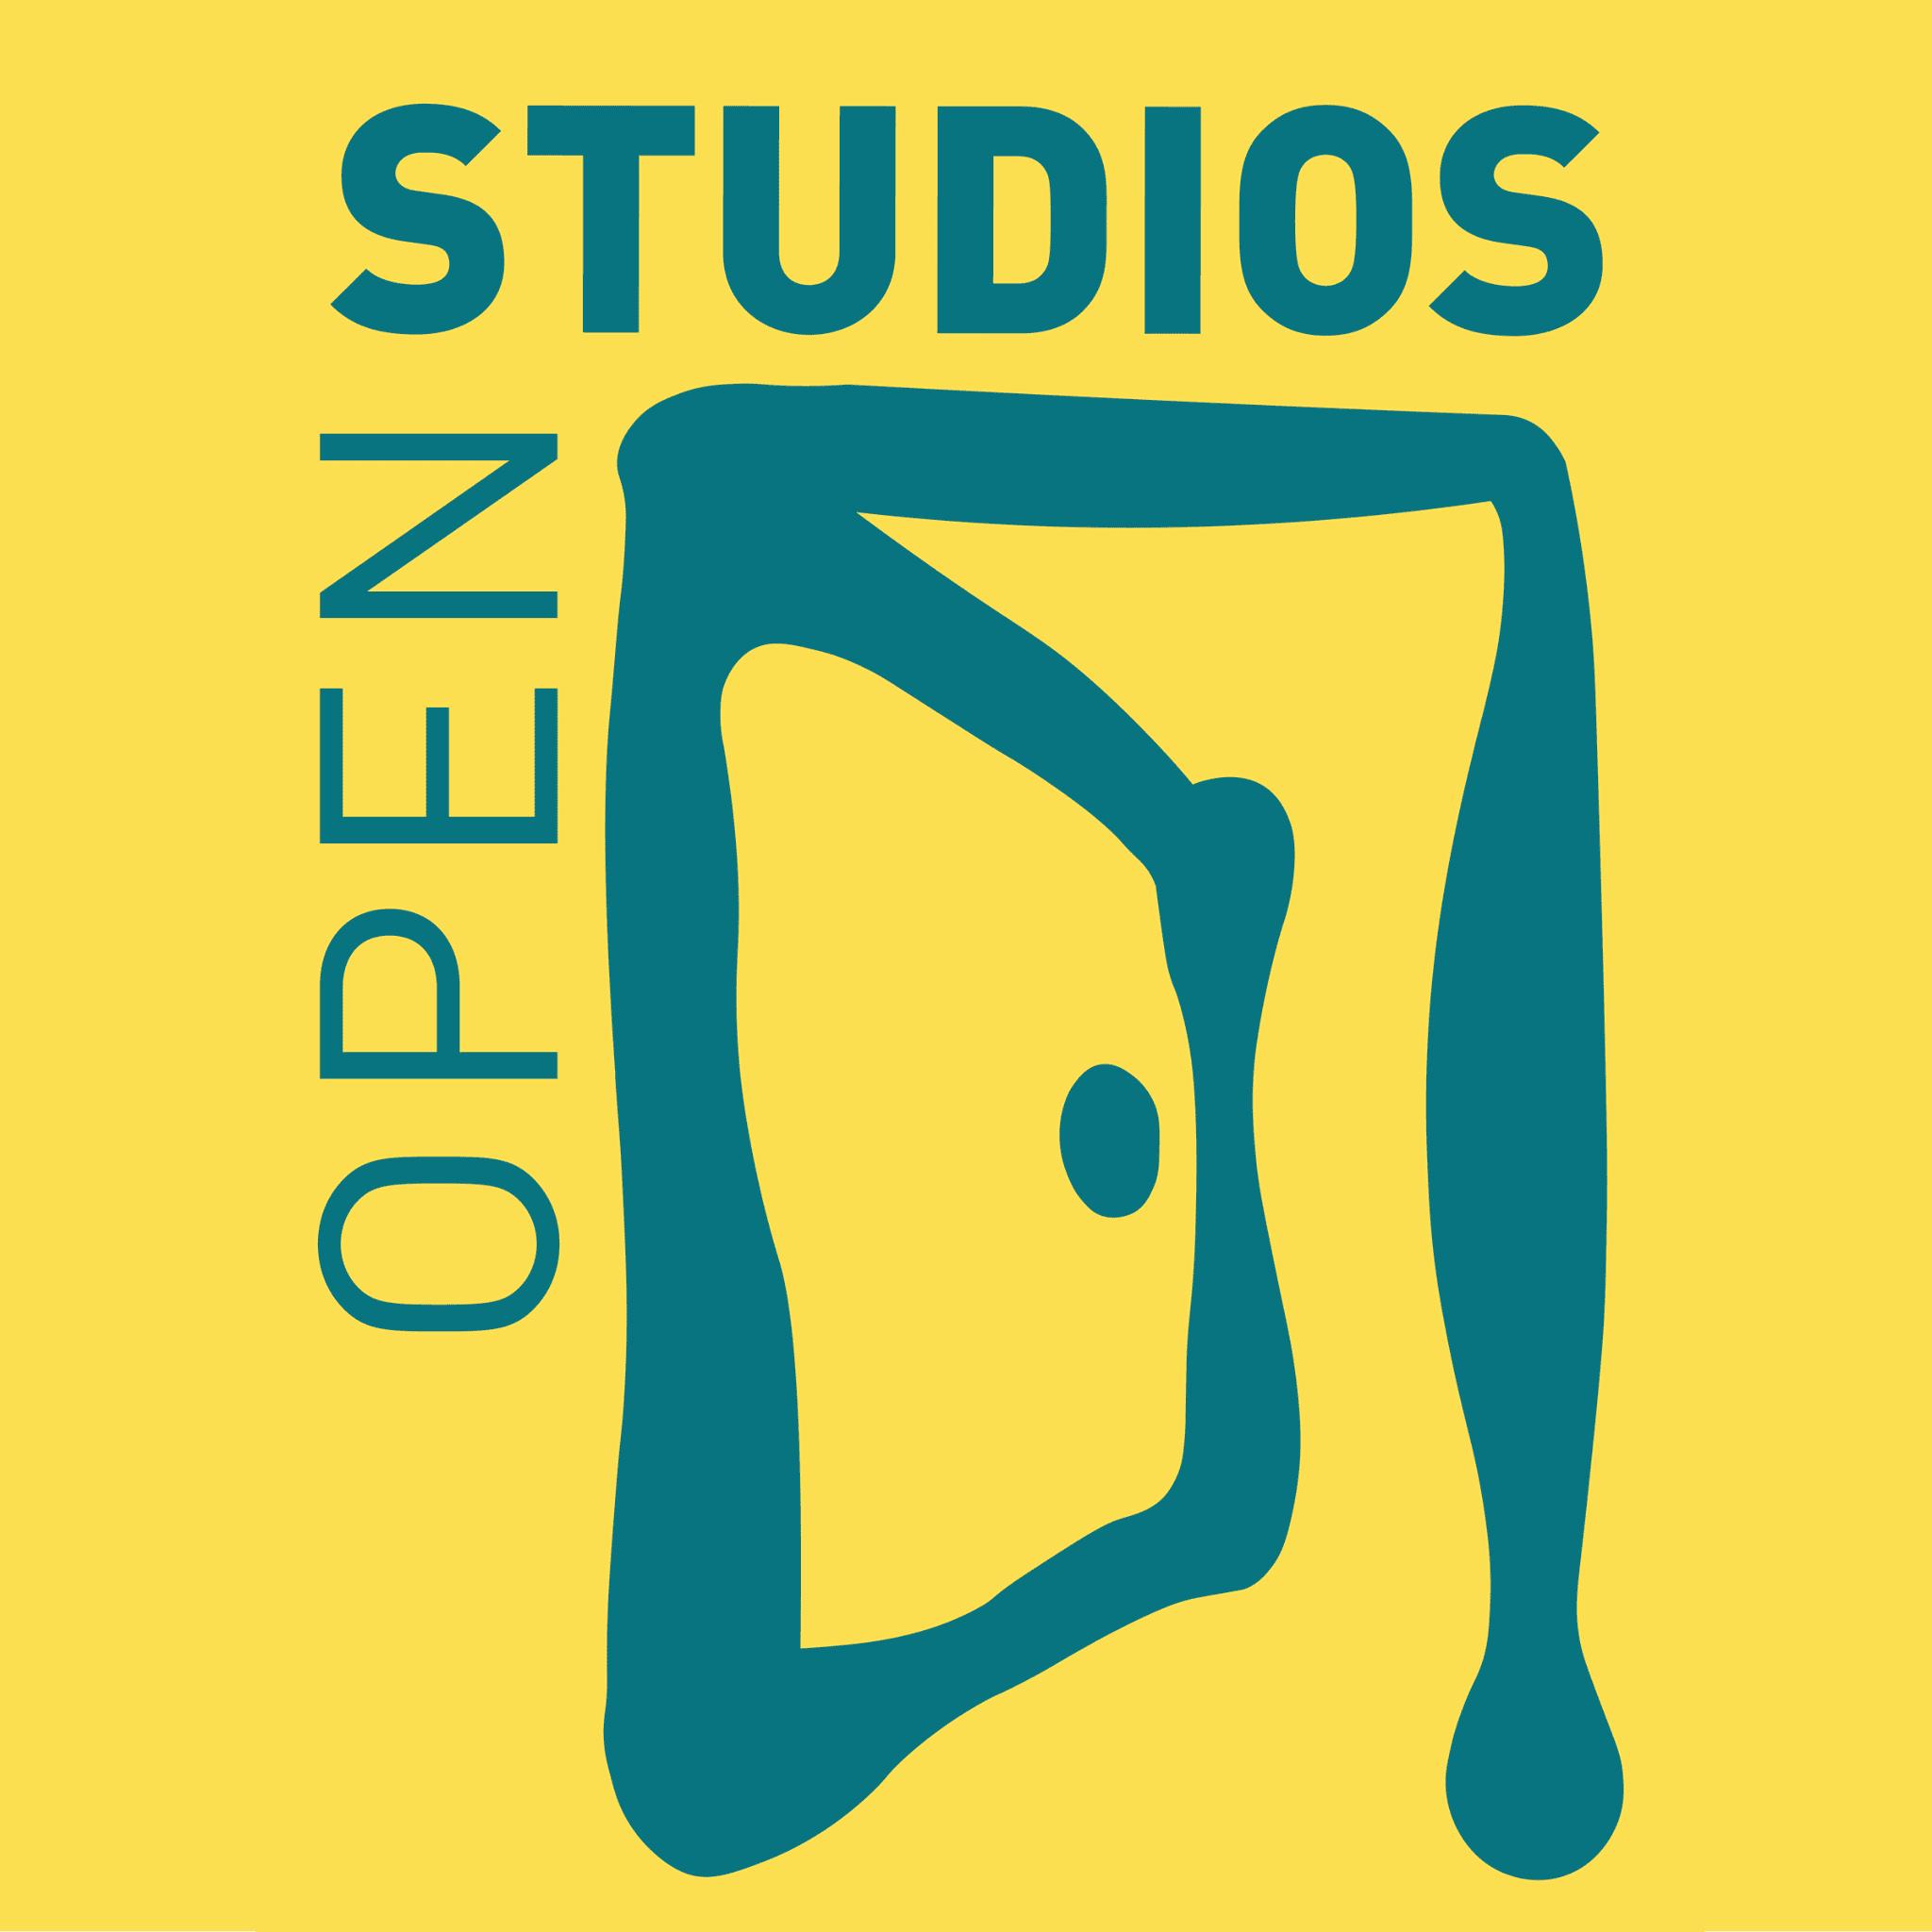 boulder open studios logo